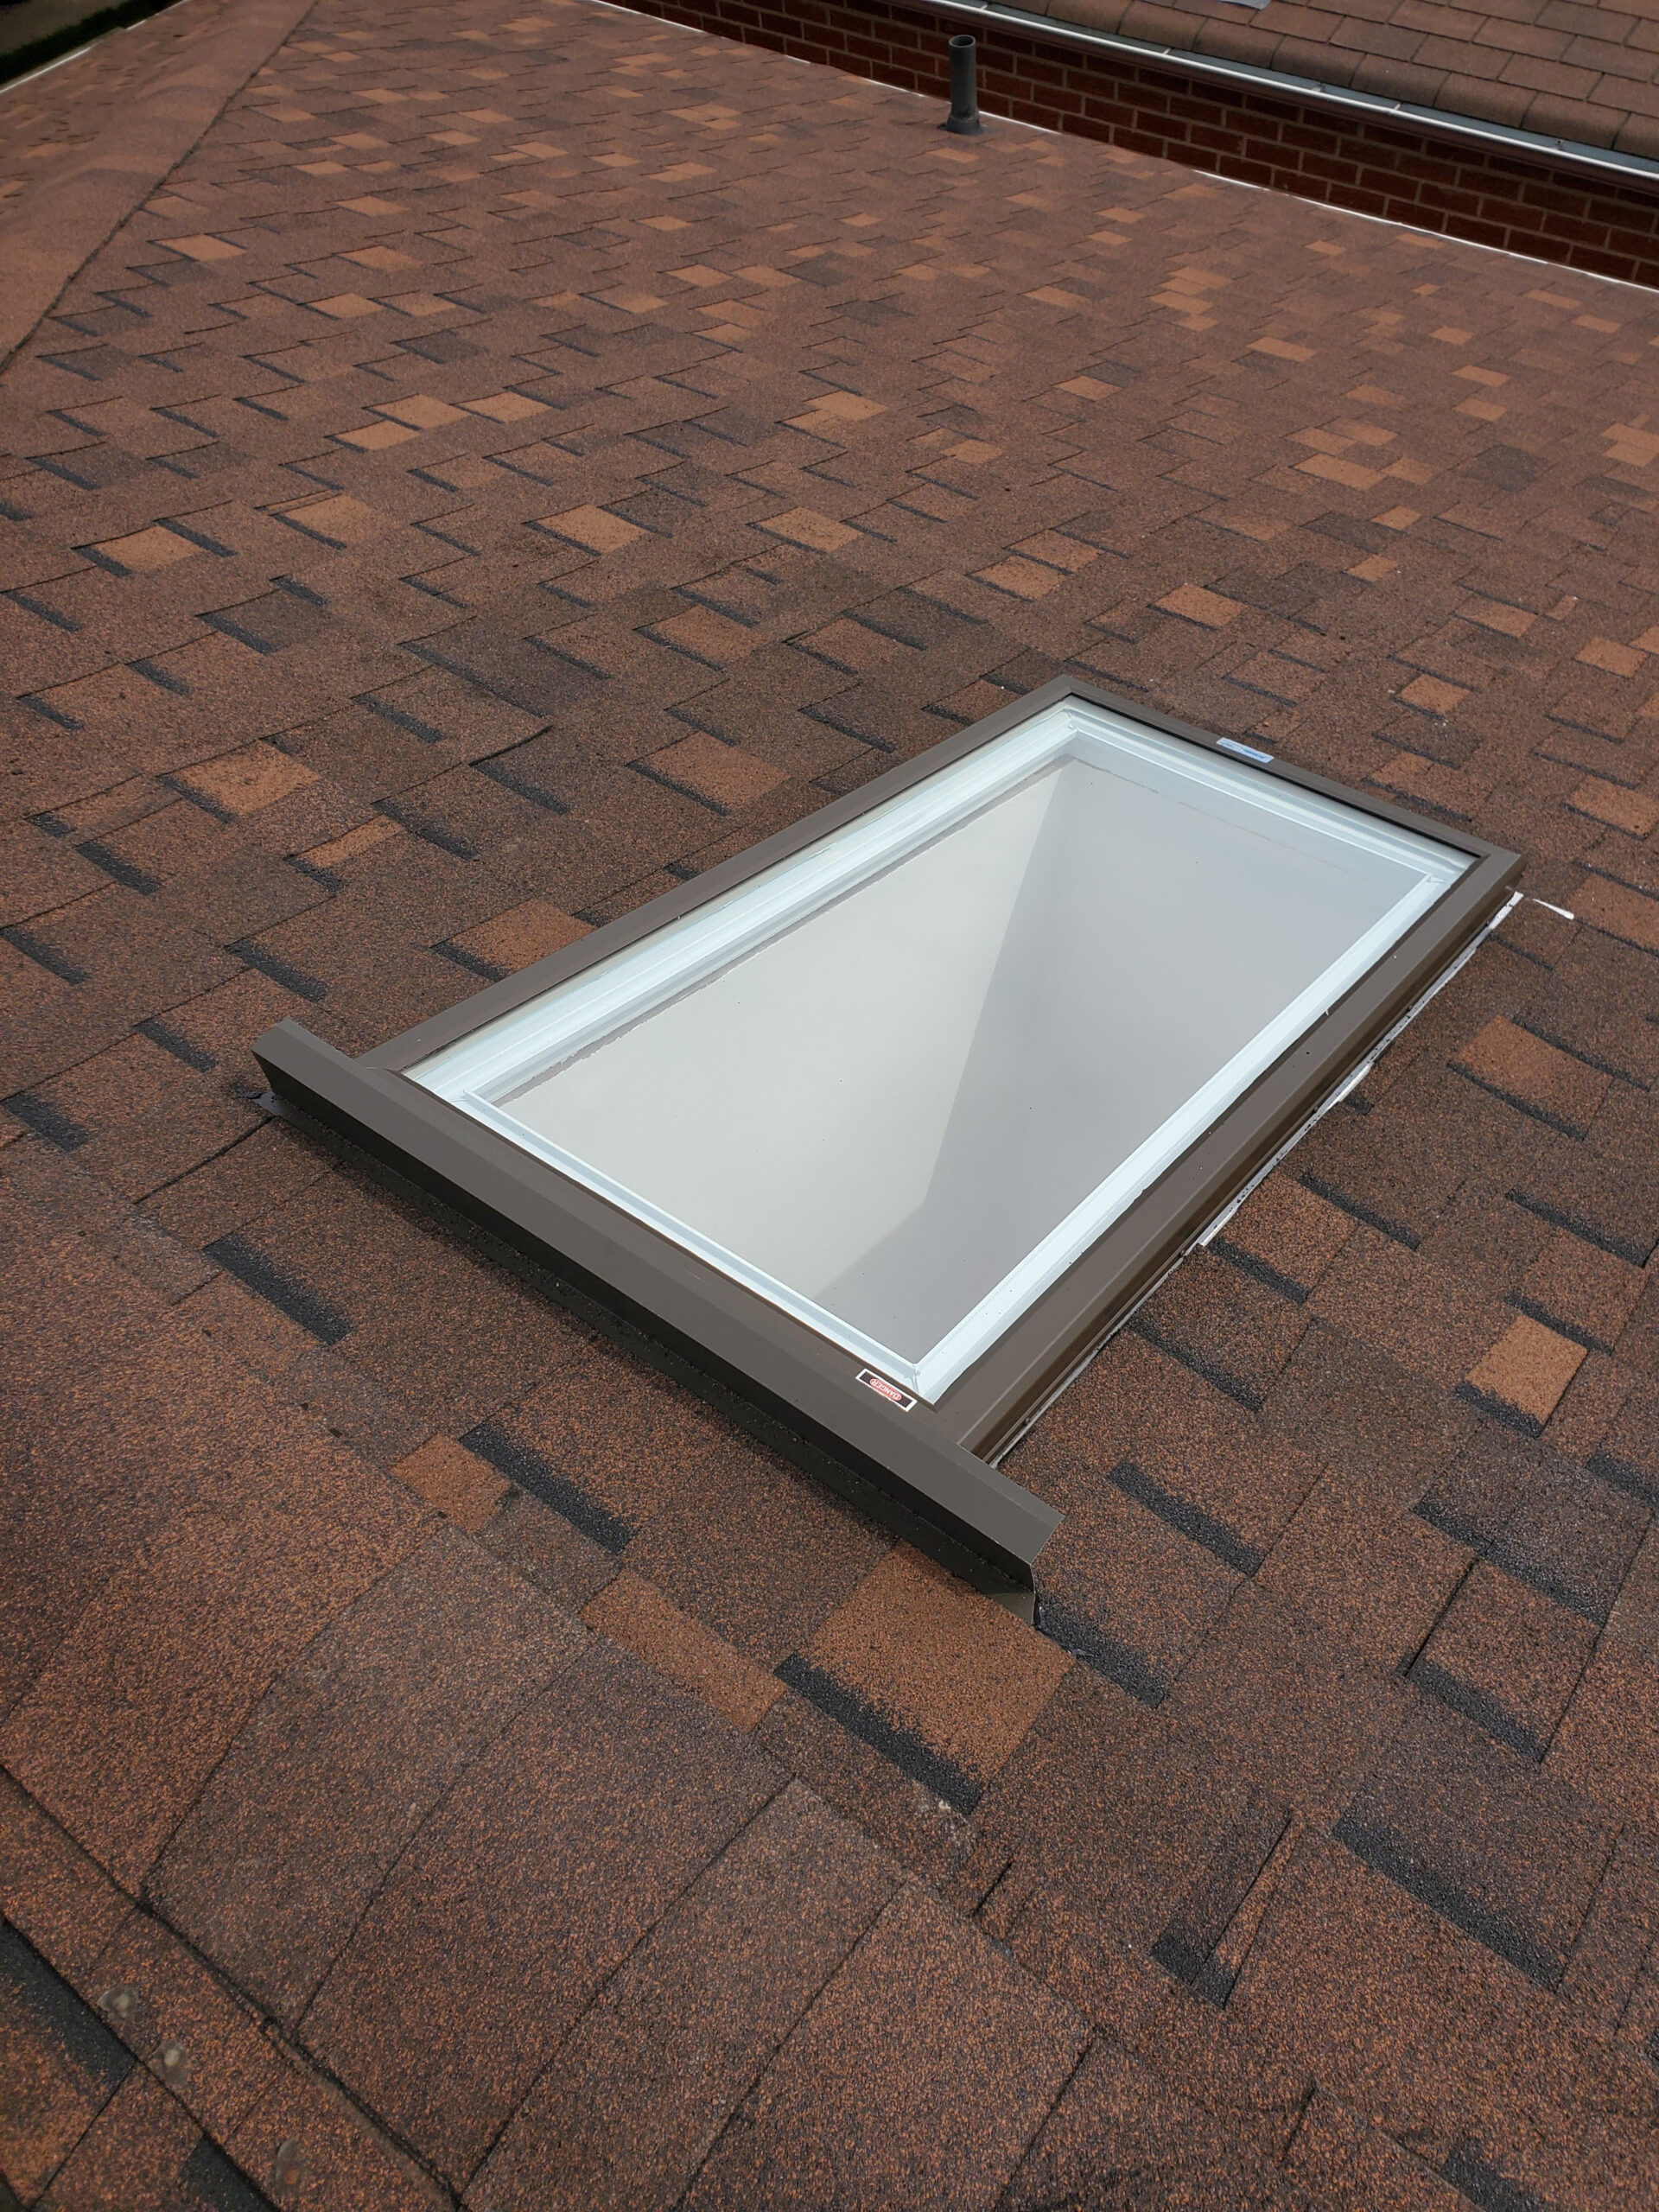 roofing-job-toronto